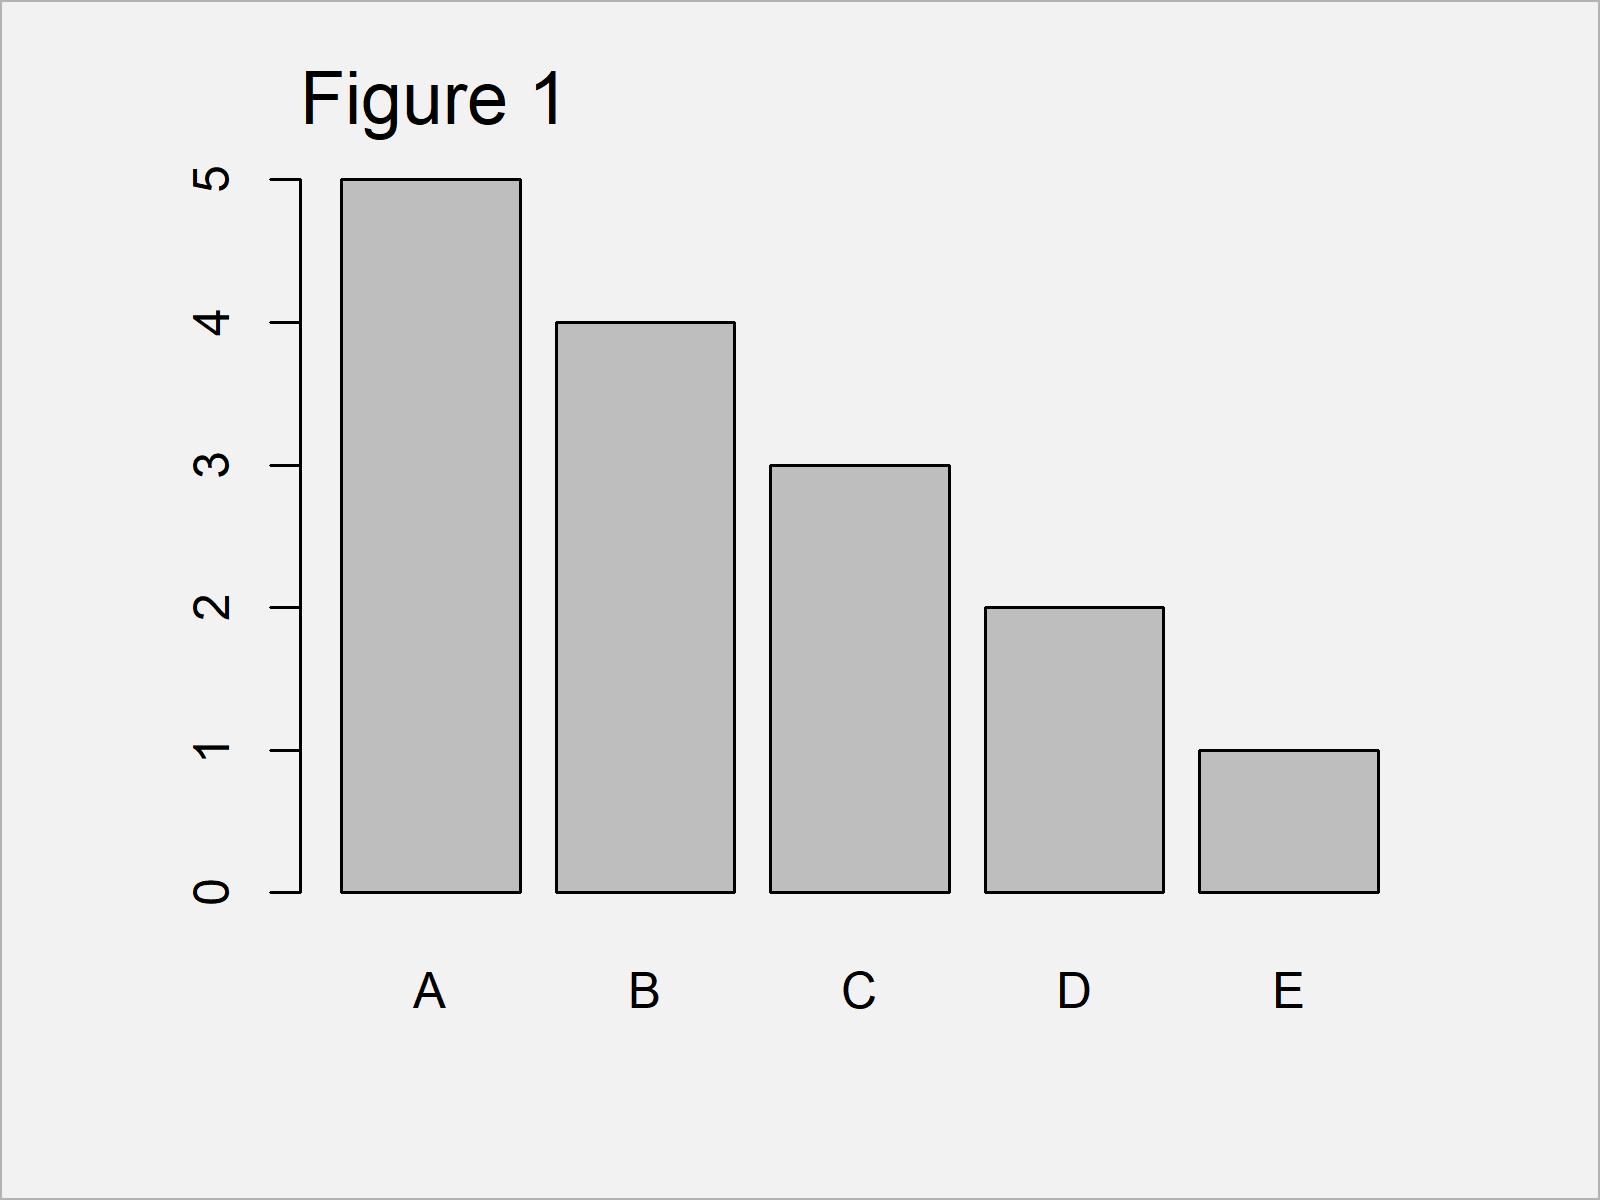 r graph figure 1 r error barplot height must be vector or matrix